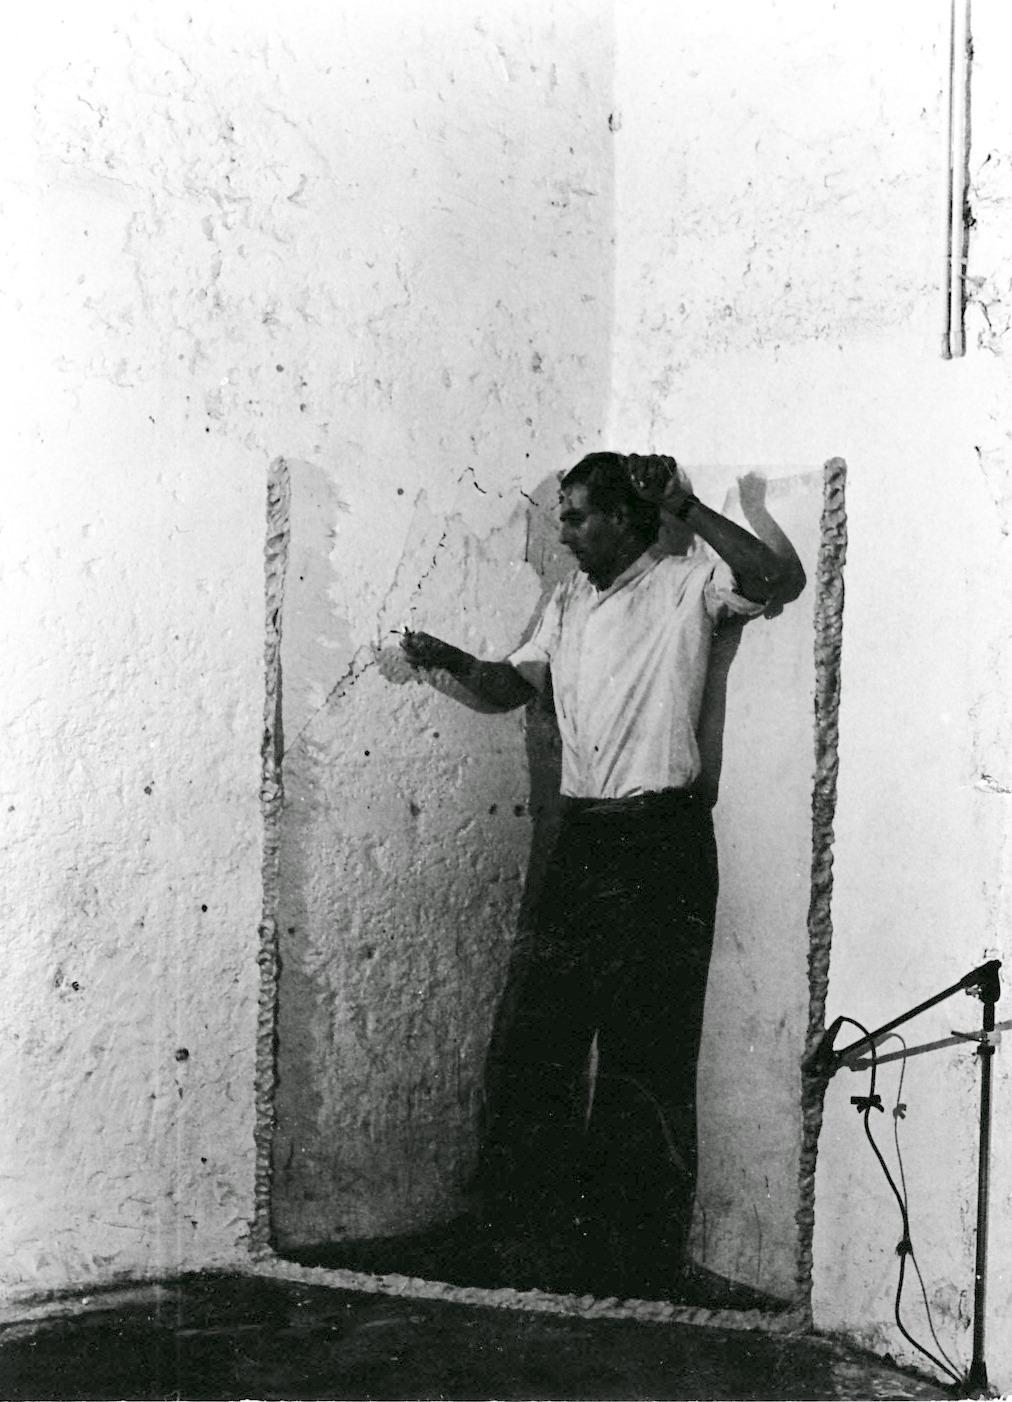 Prisma,1979,performance,LeCinéma,ihkv.Premier Symposium d'art Performance Lyon,F